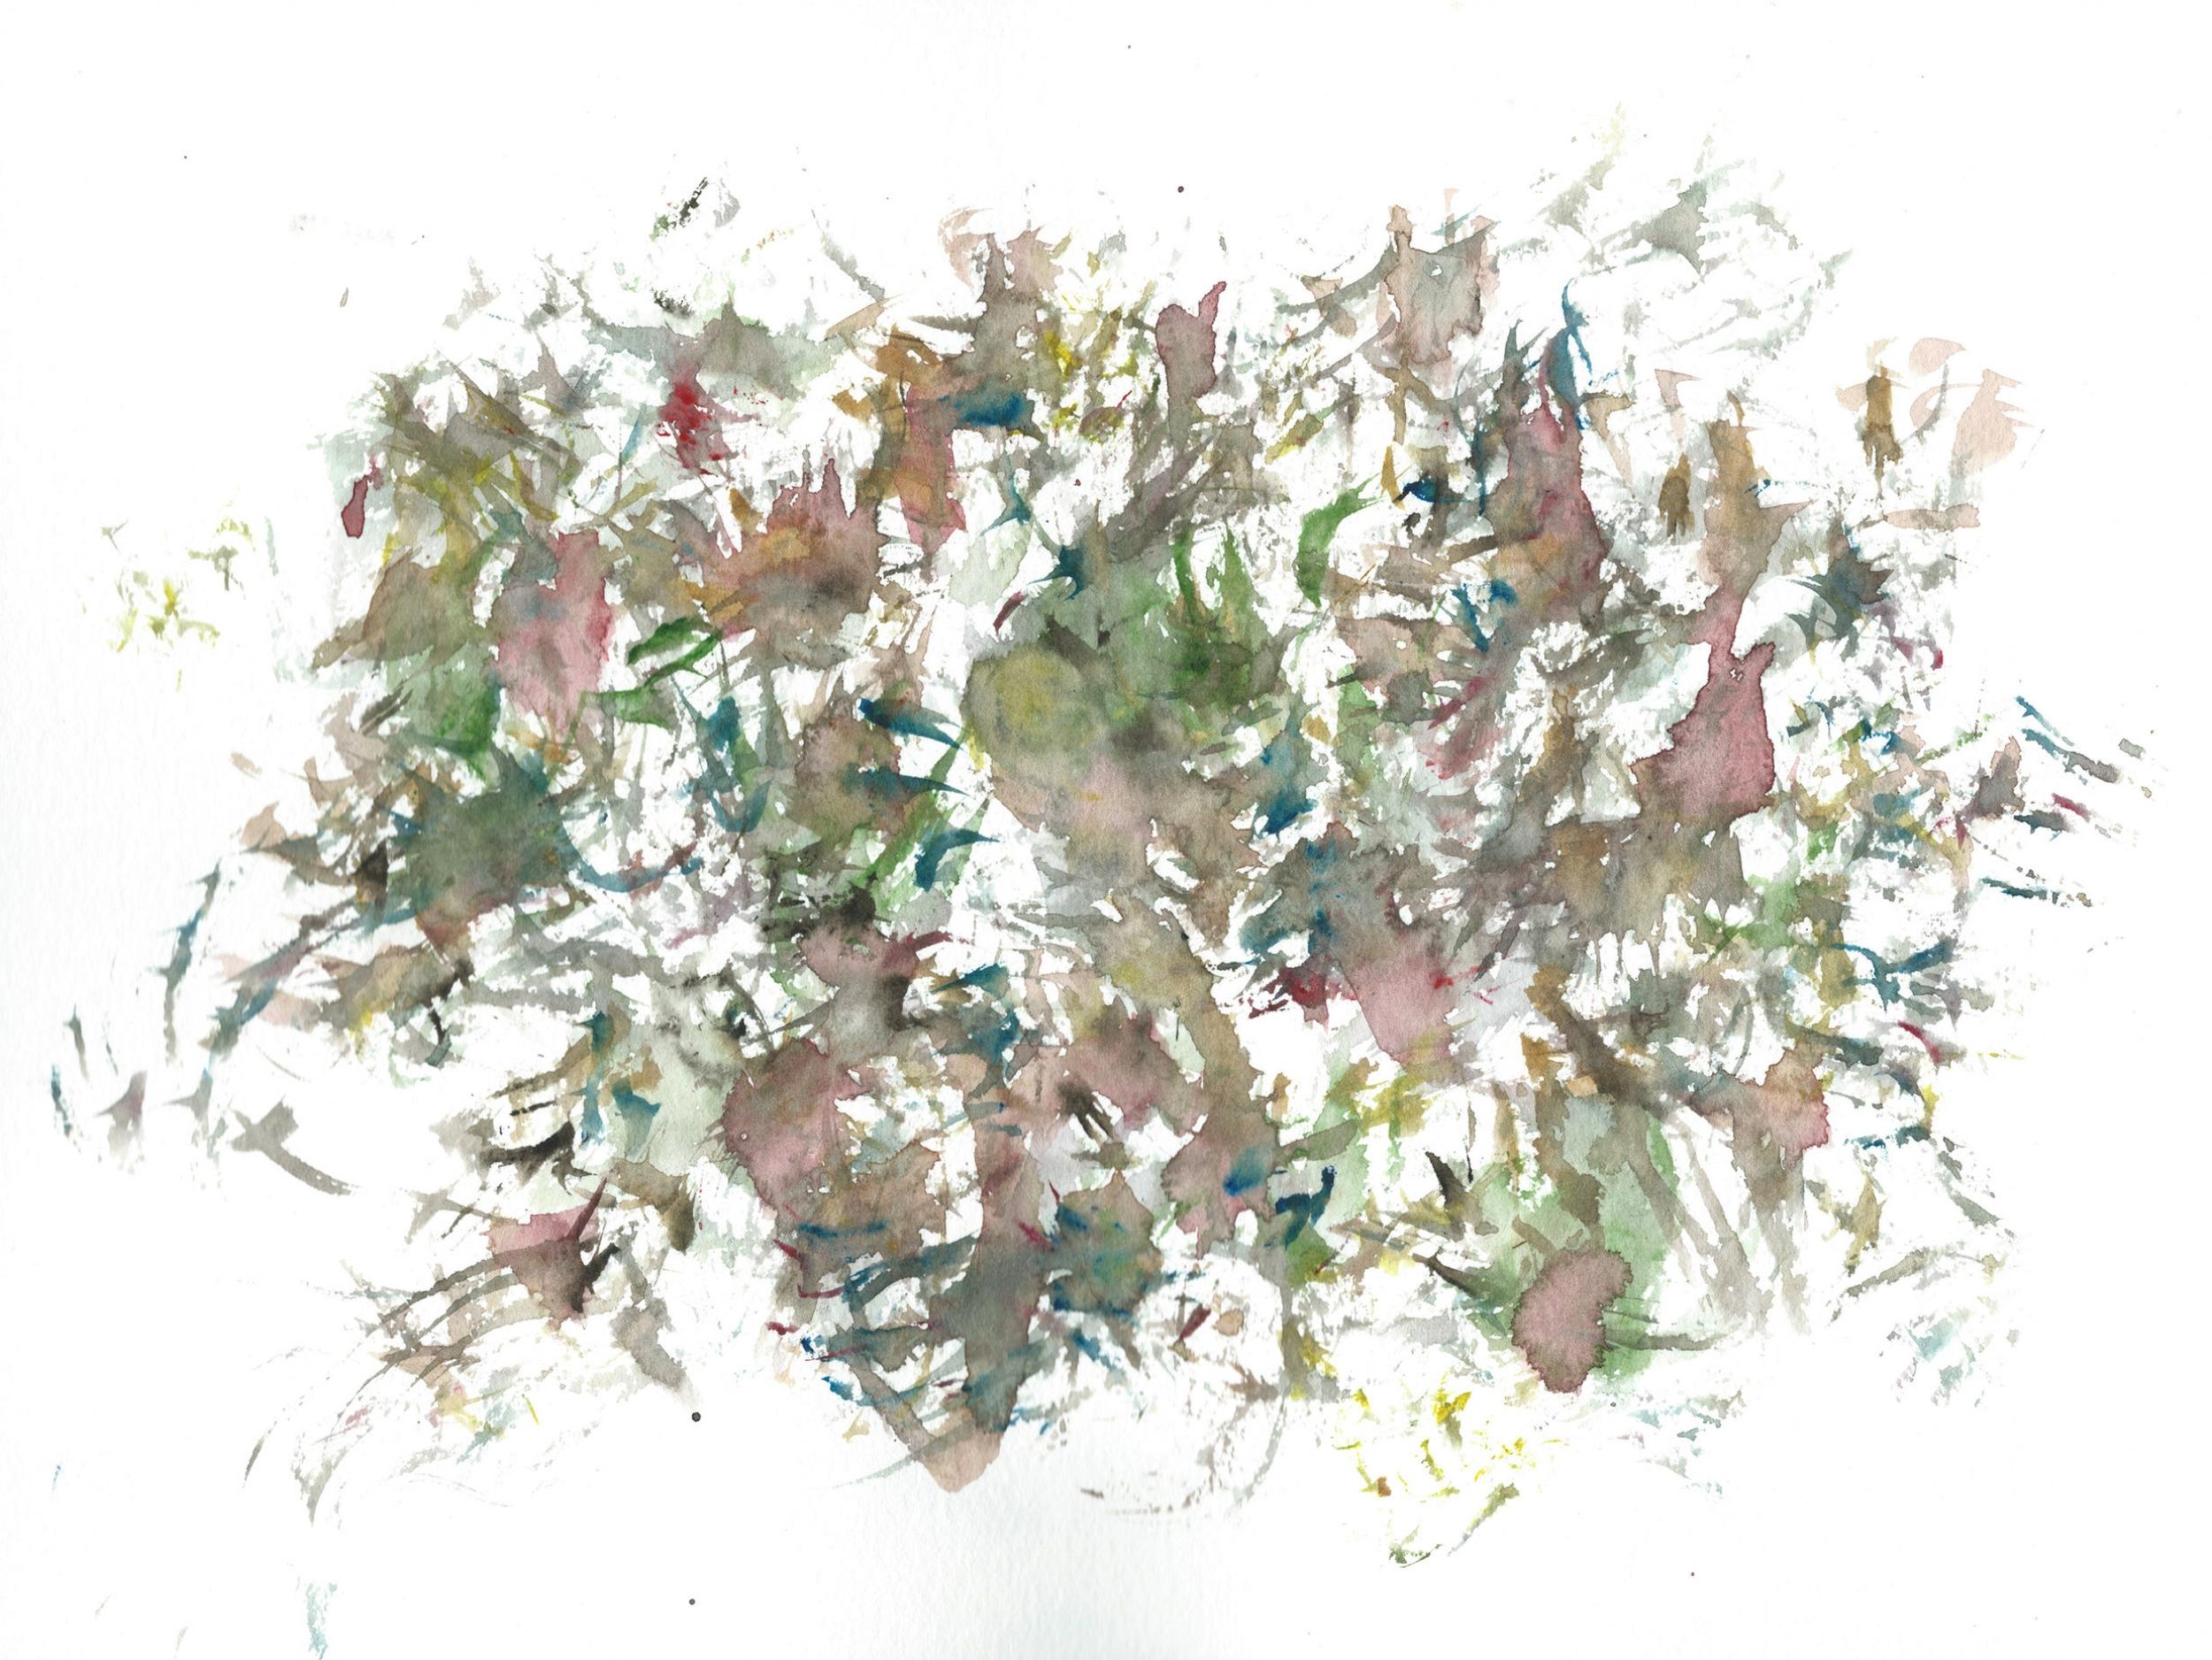 Stephen Thomas, Yoga, Yoga-Svarupa, watercolor 17